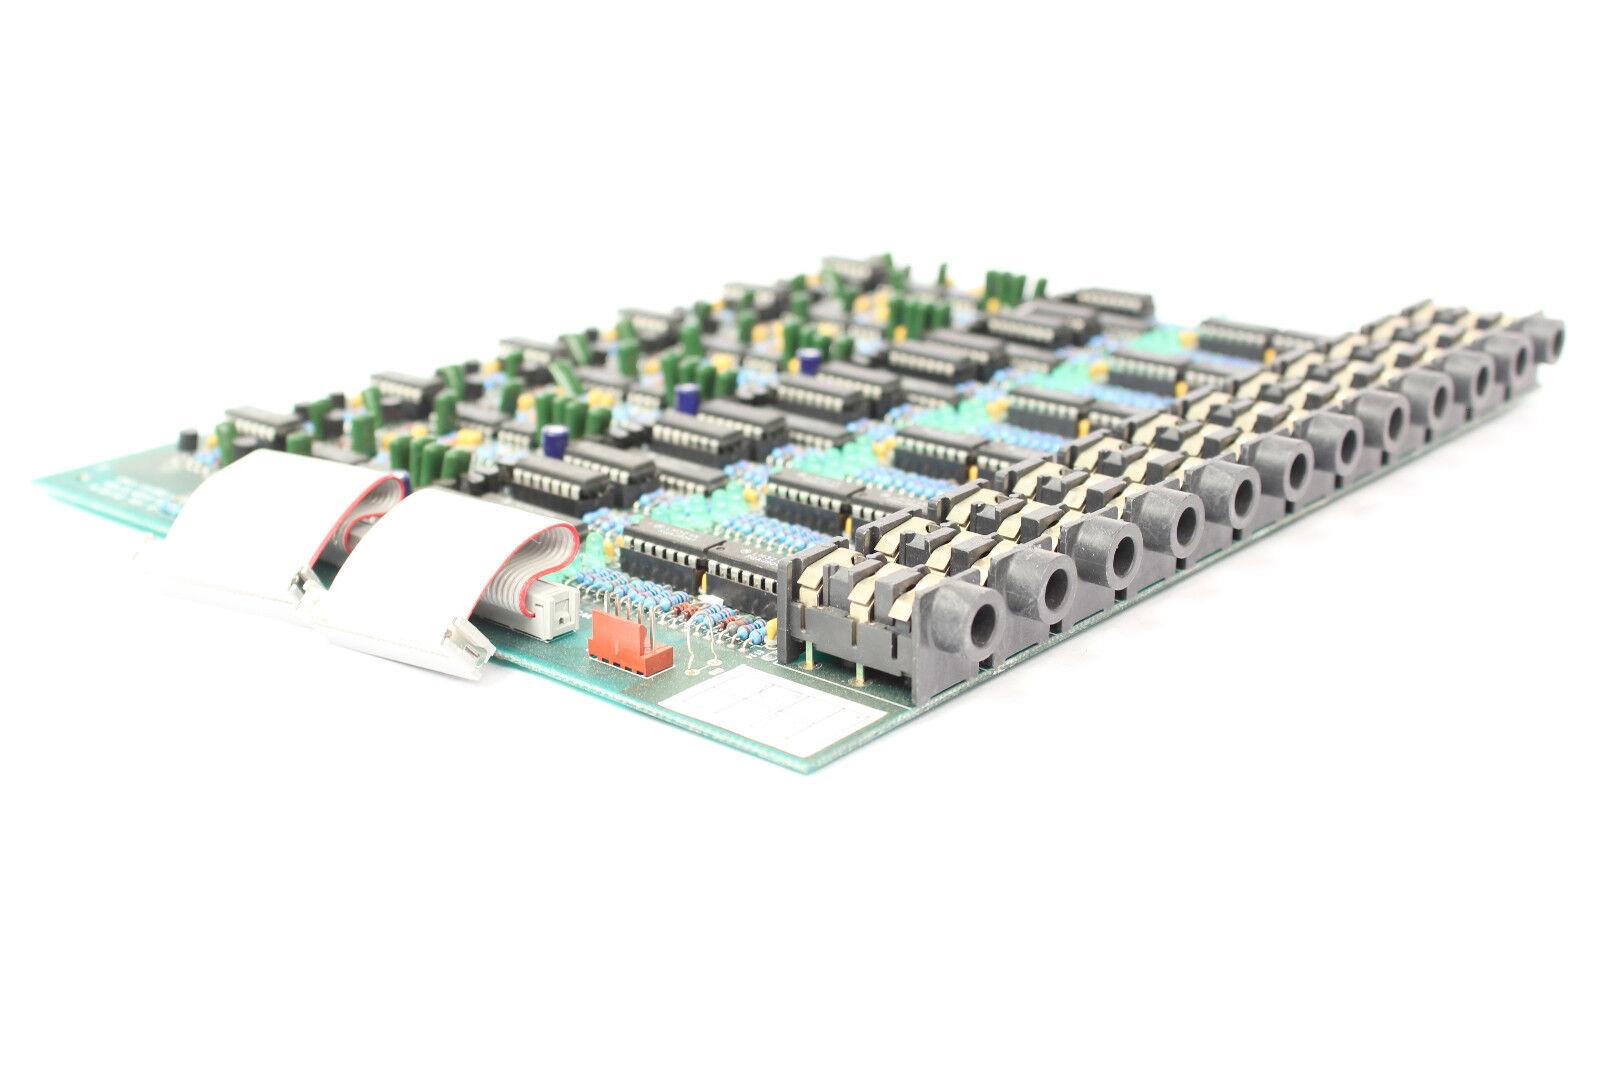 Raro Aphex impulso impulso impulso Audio PCB placa principal de audio 68-165 For Impulse   nuevo Nos  f2557f